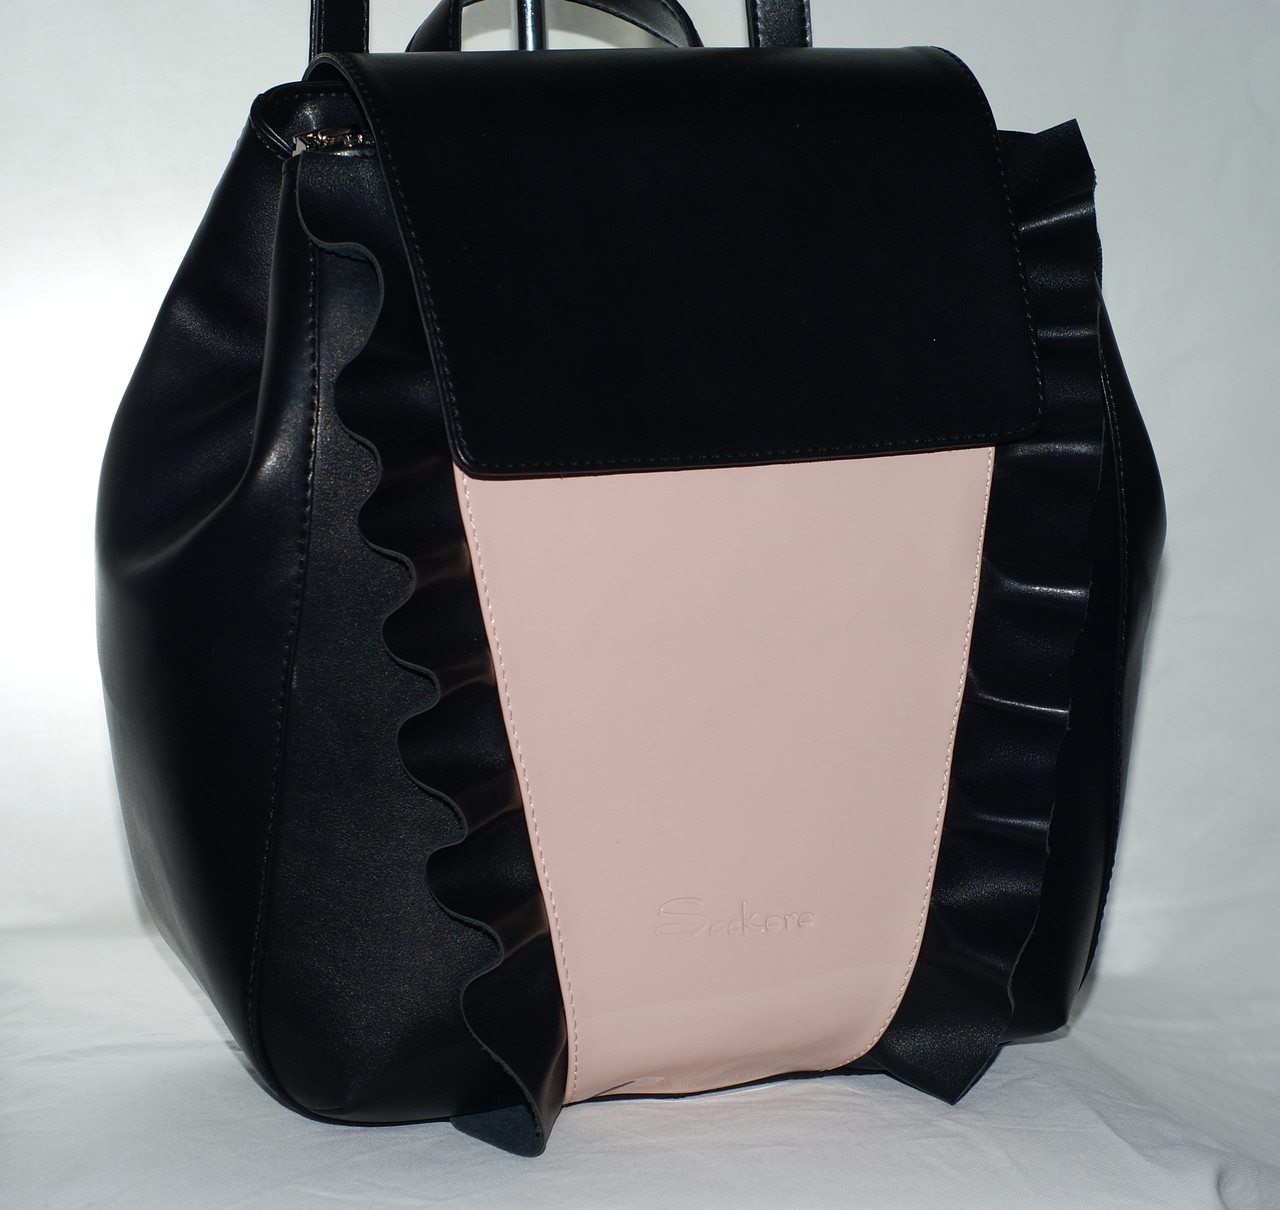 f8c79a410d2c Стильная женская сумка-рюкзак от производителя: продажа, цена в ...